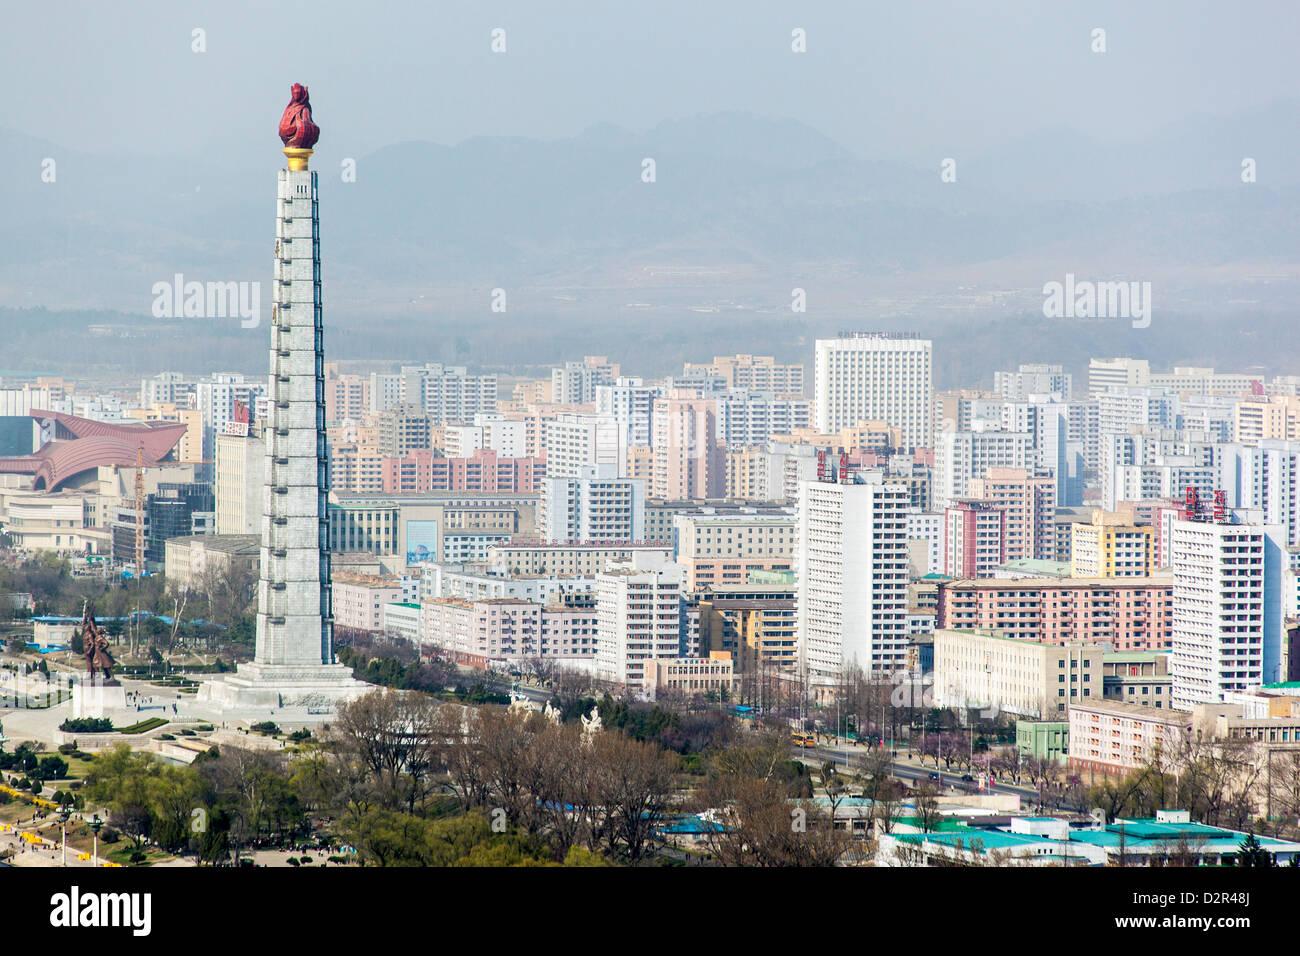 City skyline and the Juche Tower, Pyongyang, Democratic People's Republic of Korea (DPRK), North Korea, Asia - Stock Image